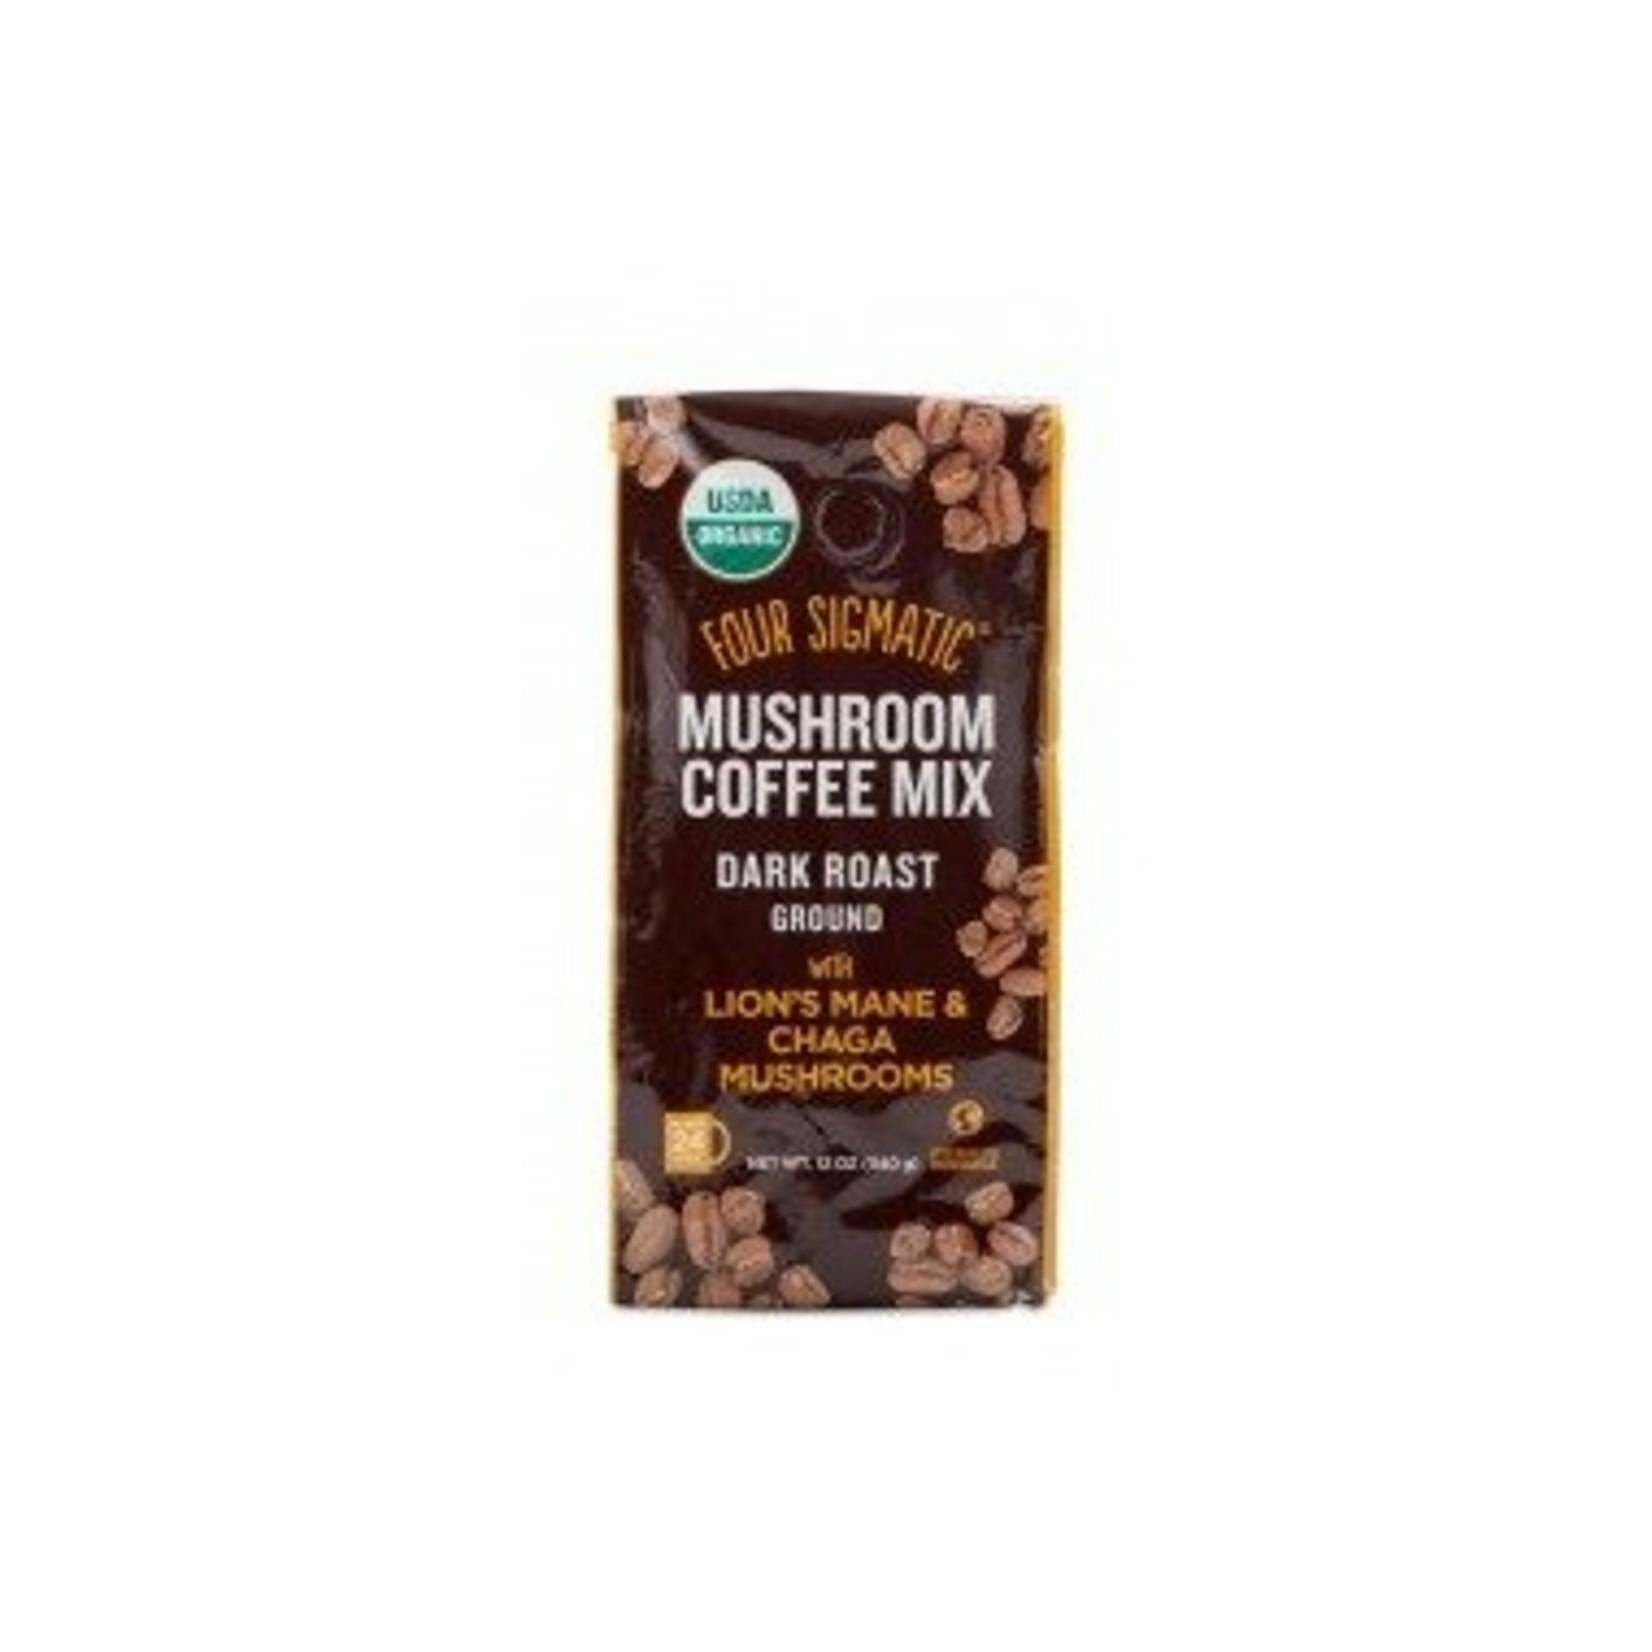 Four Sigmatic Mushroom Coffee Mix Dark Roast with Lion's Mane and Chaga 12oz